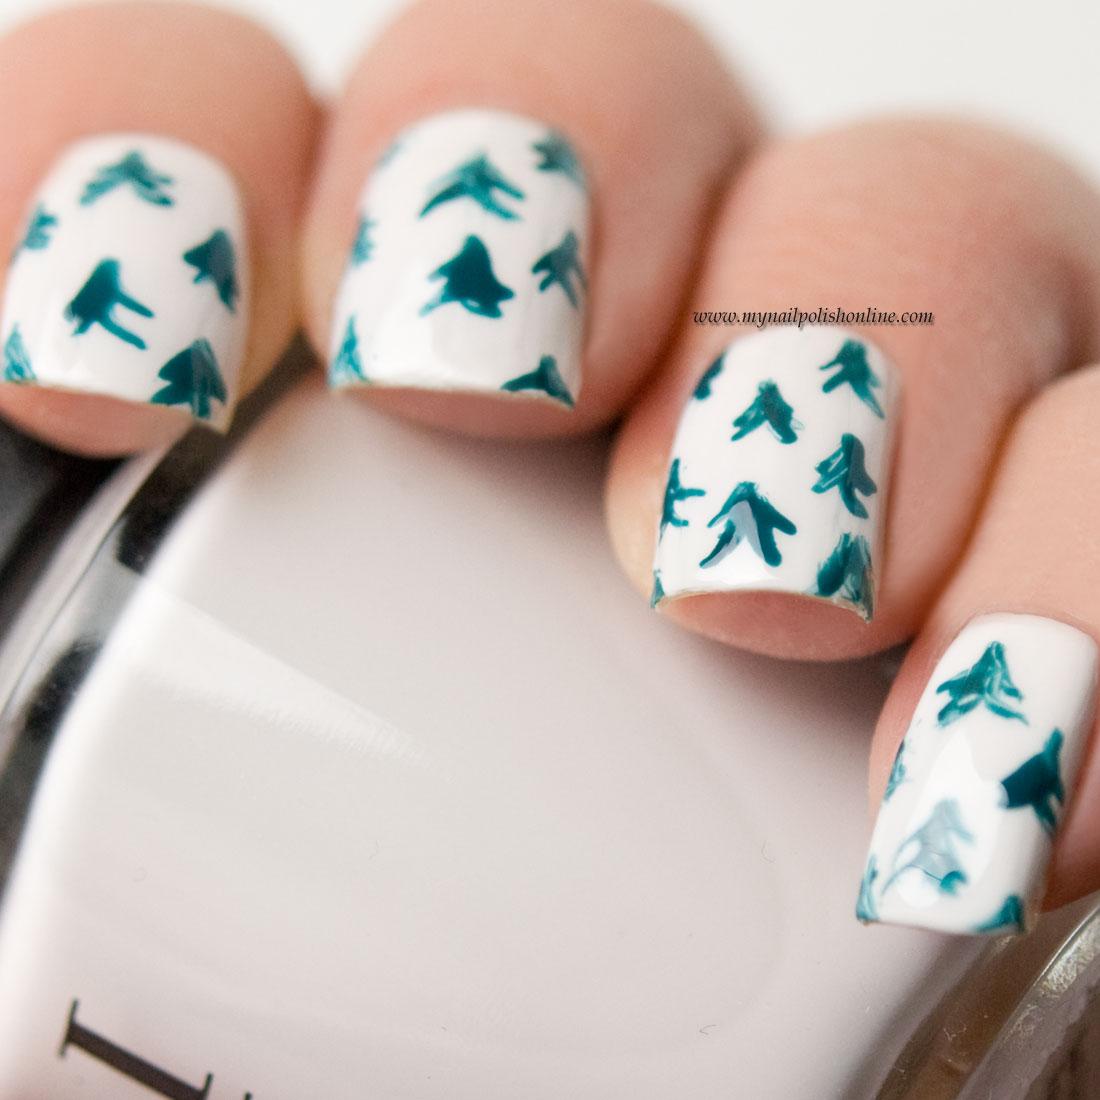 Nail Art – Winter Trees